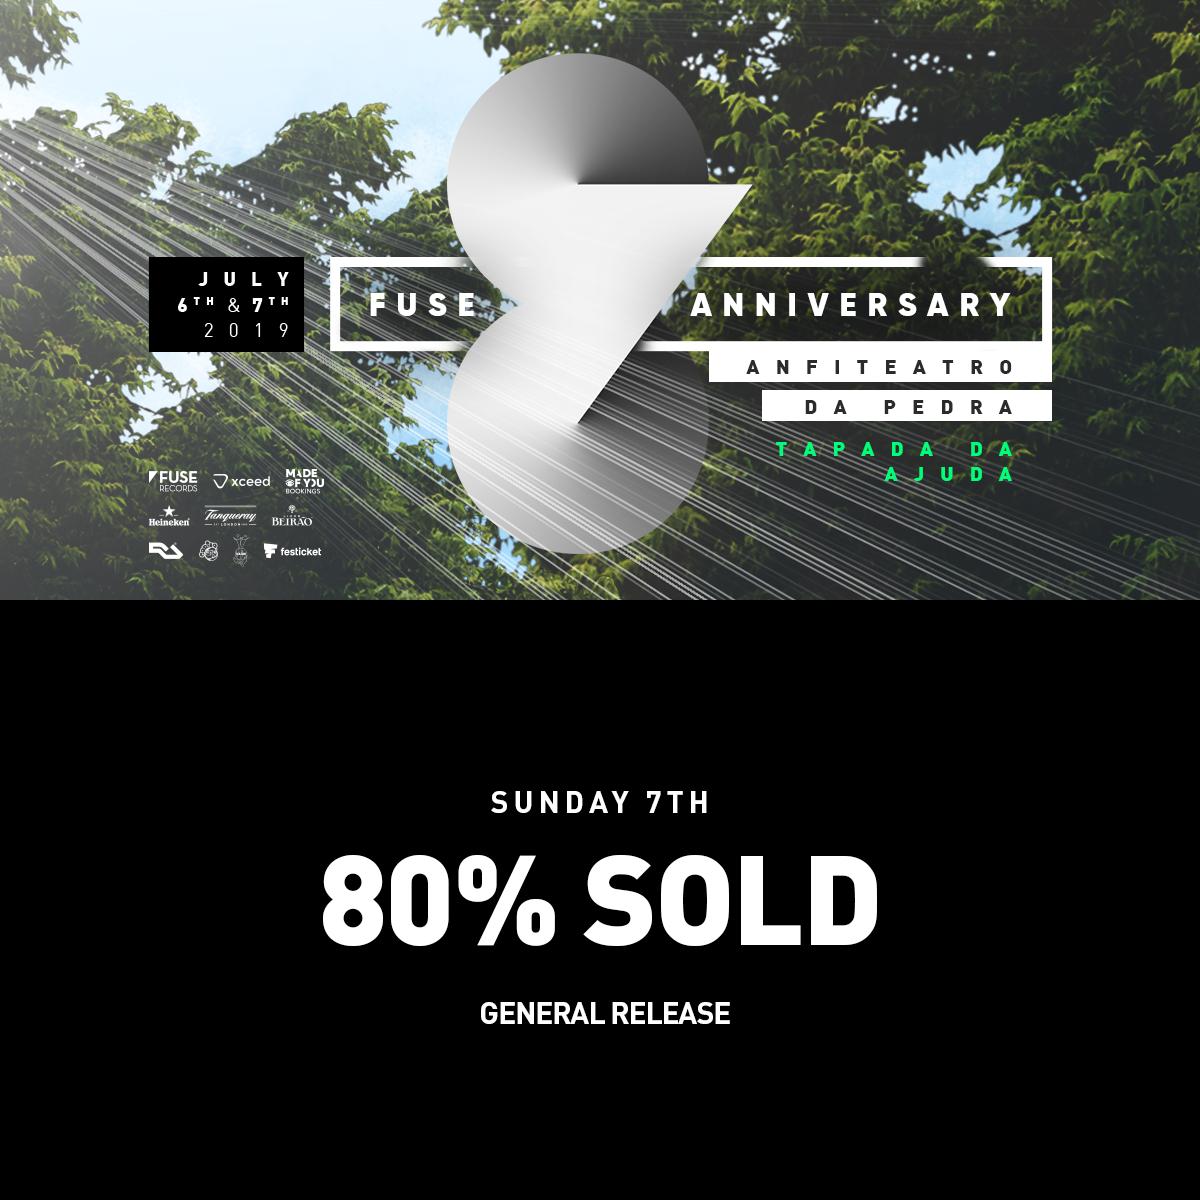 FuseMatine_aniversario_profile_Sold_domingo_80.png